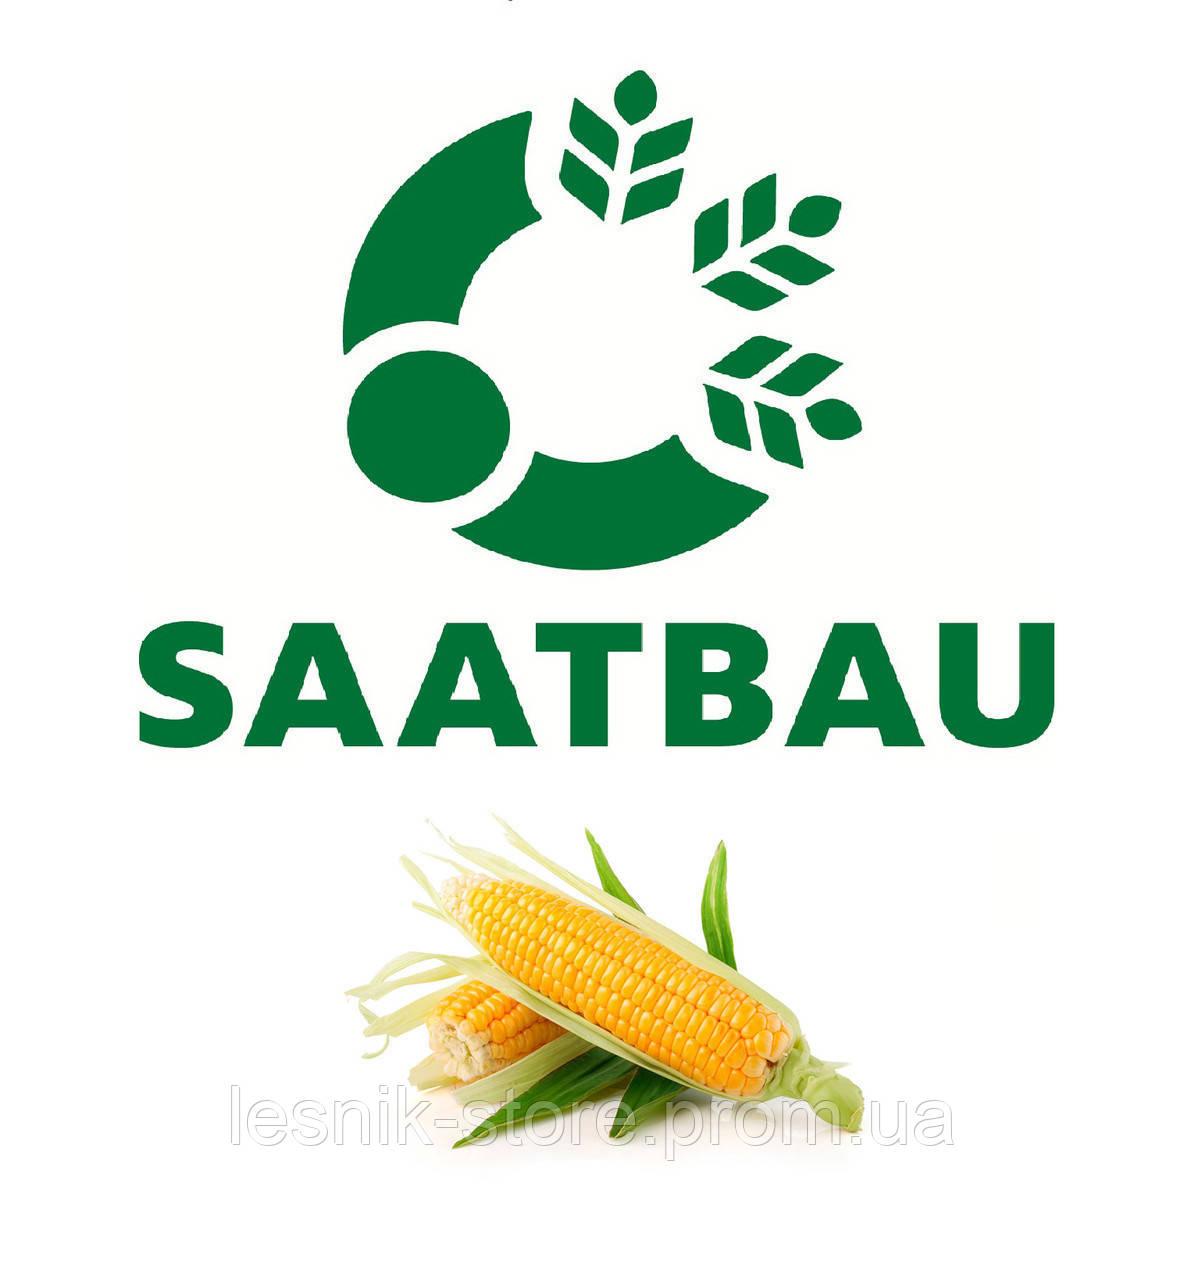 Семена кукурузы, Saatbau, Торрано